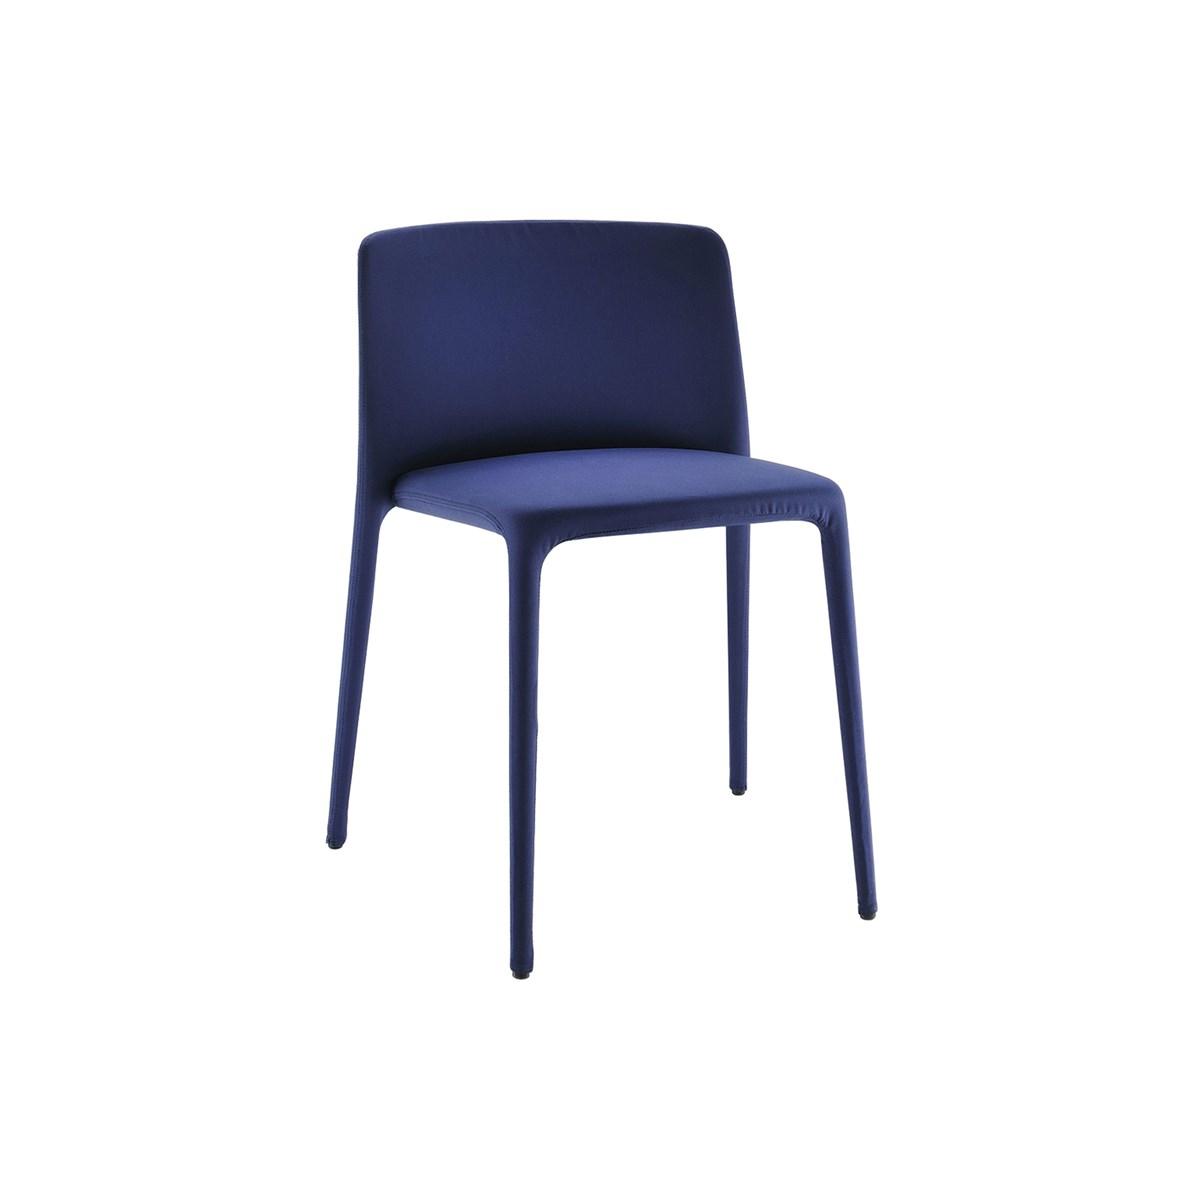 MDF-Italia-Jean-Marie-Massaud-Achille-Chair-Matisse-1